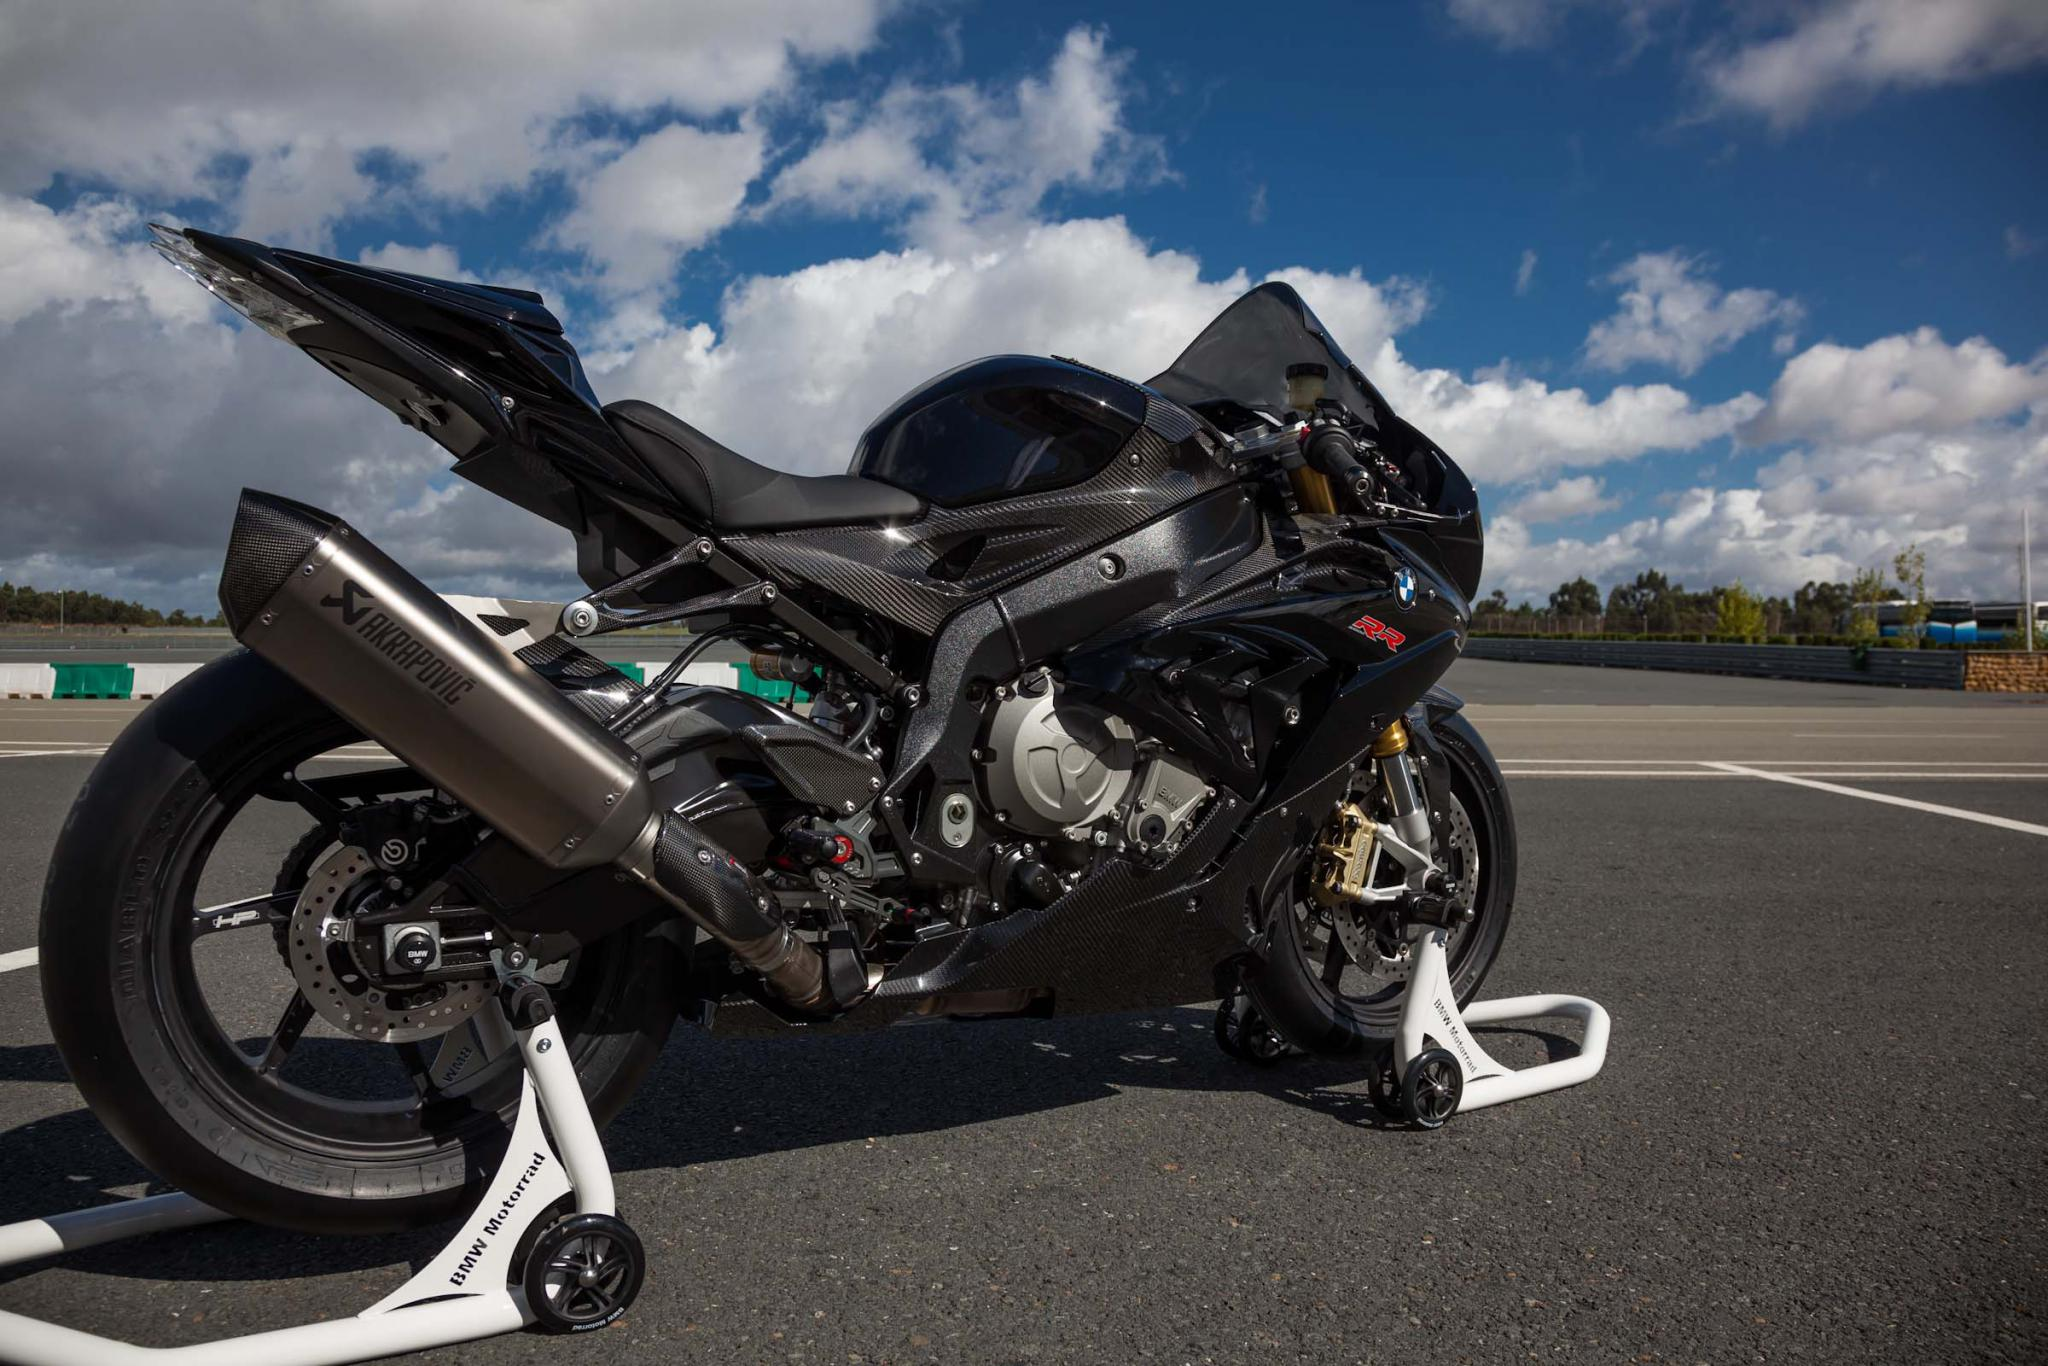 bmw s 1000 rr 2015 hp raceparts motorrad fotos motorrad bilder. Black Bedroom Furniture Sets. Home Design Ideas